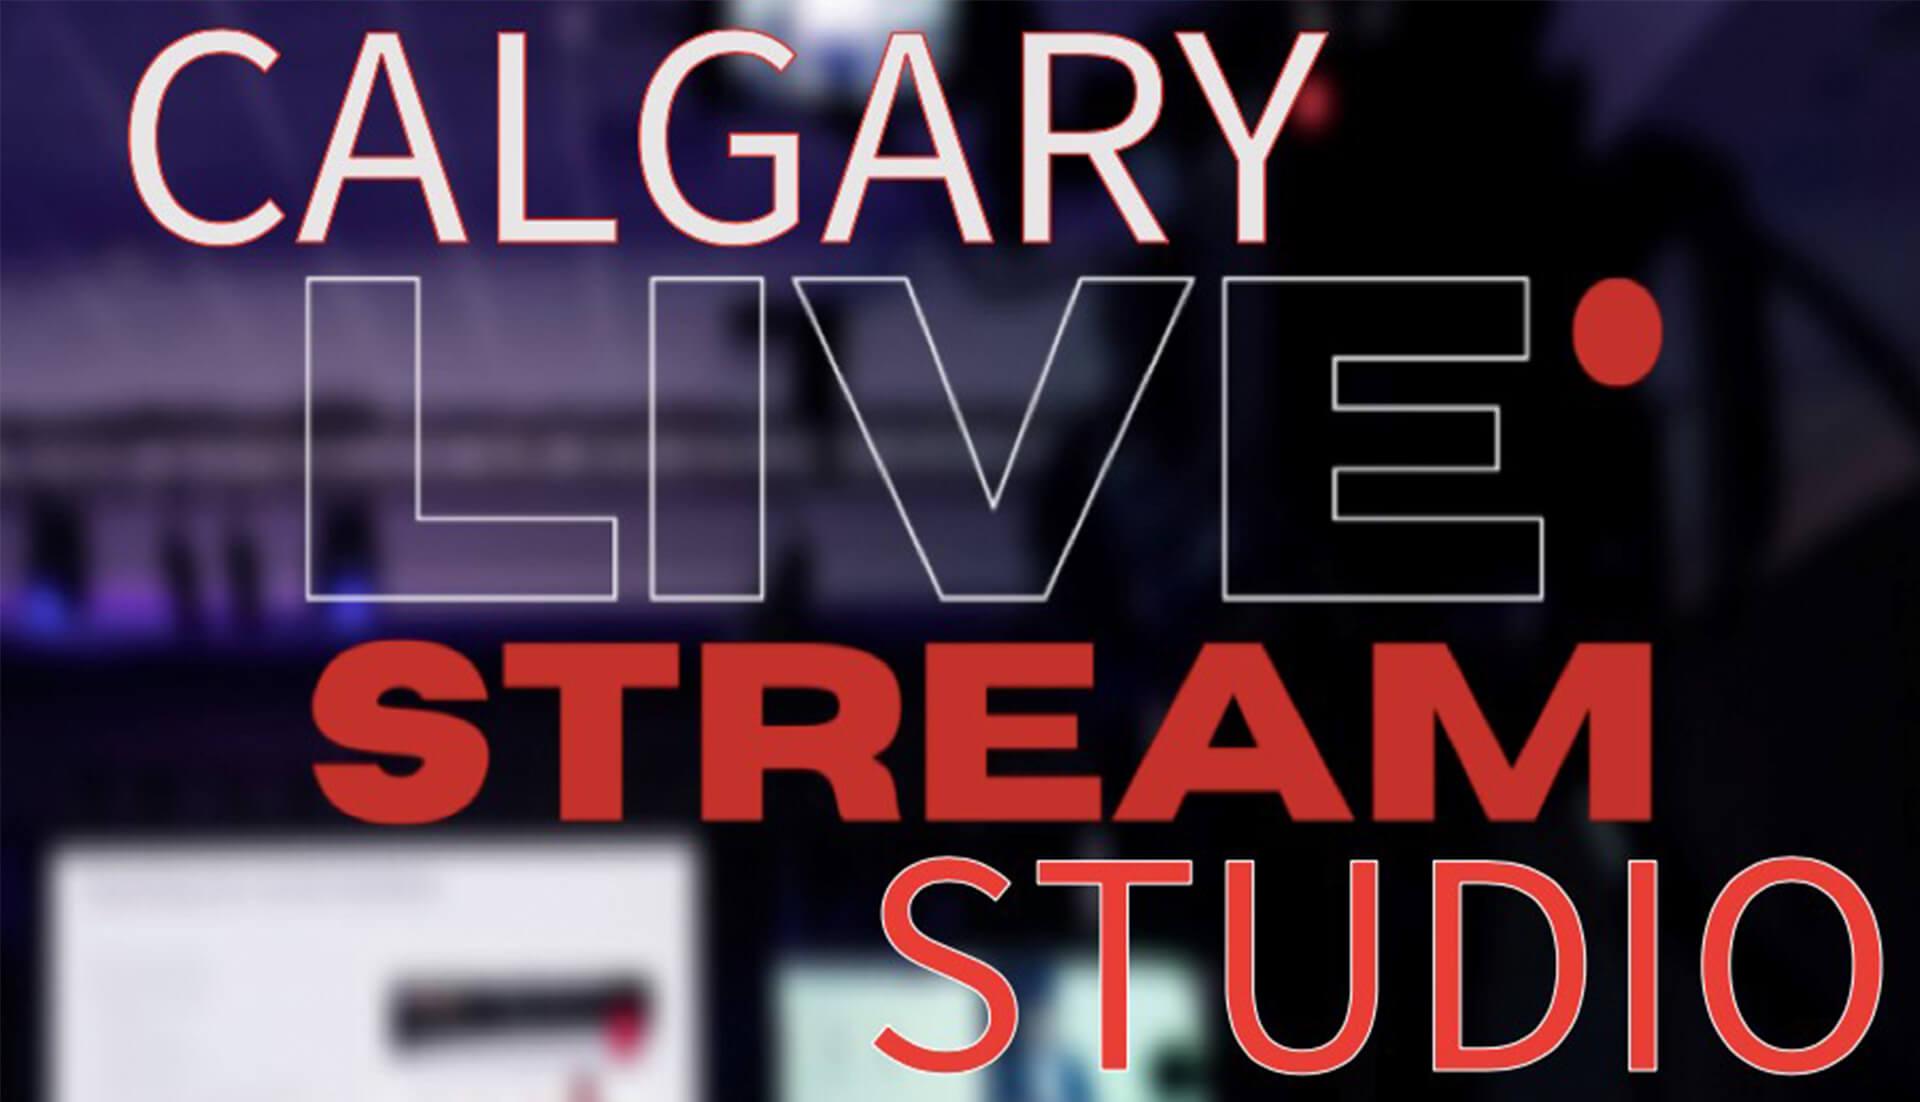 Calgary DJ Services, Audio Visual Equipment Rentals and Audio Visual